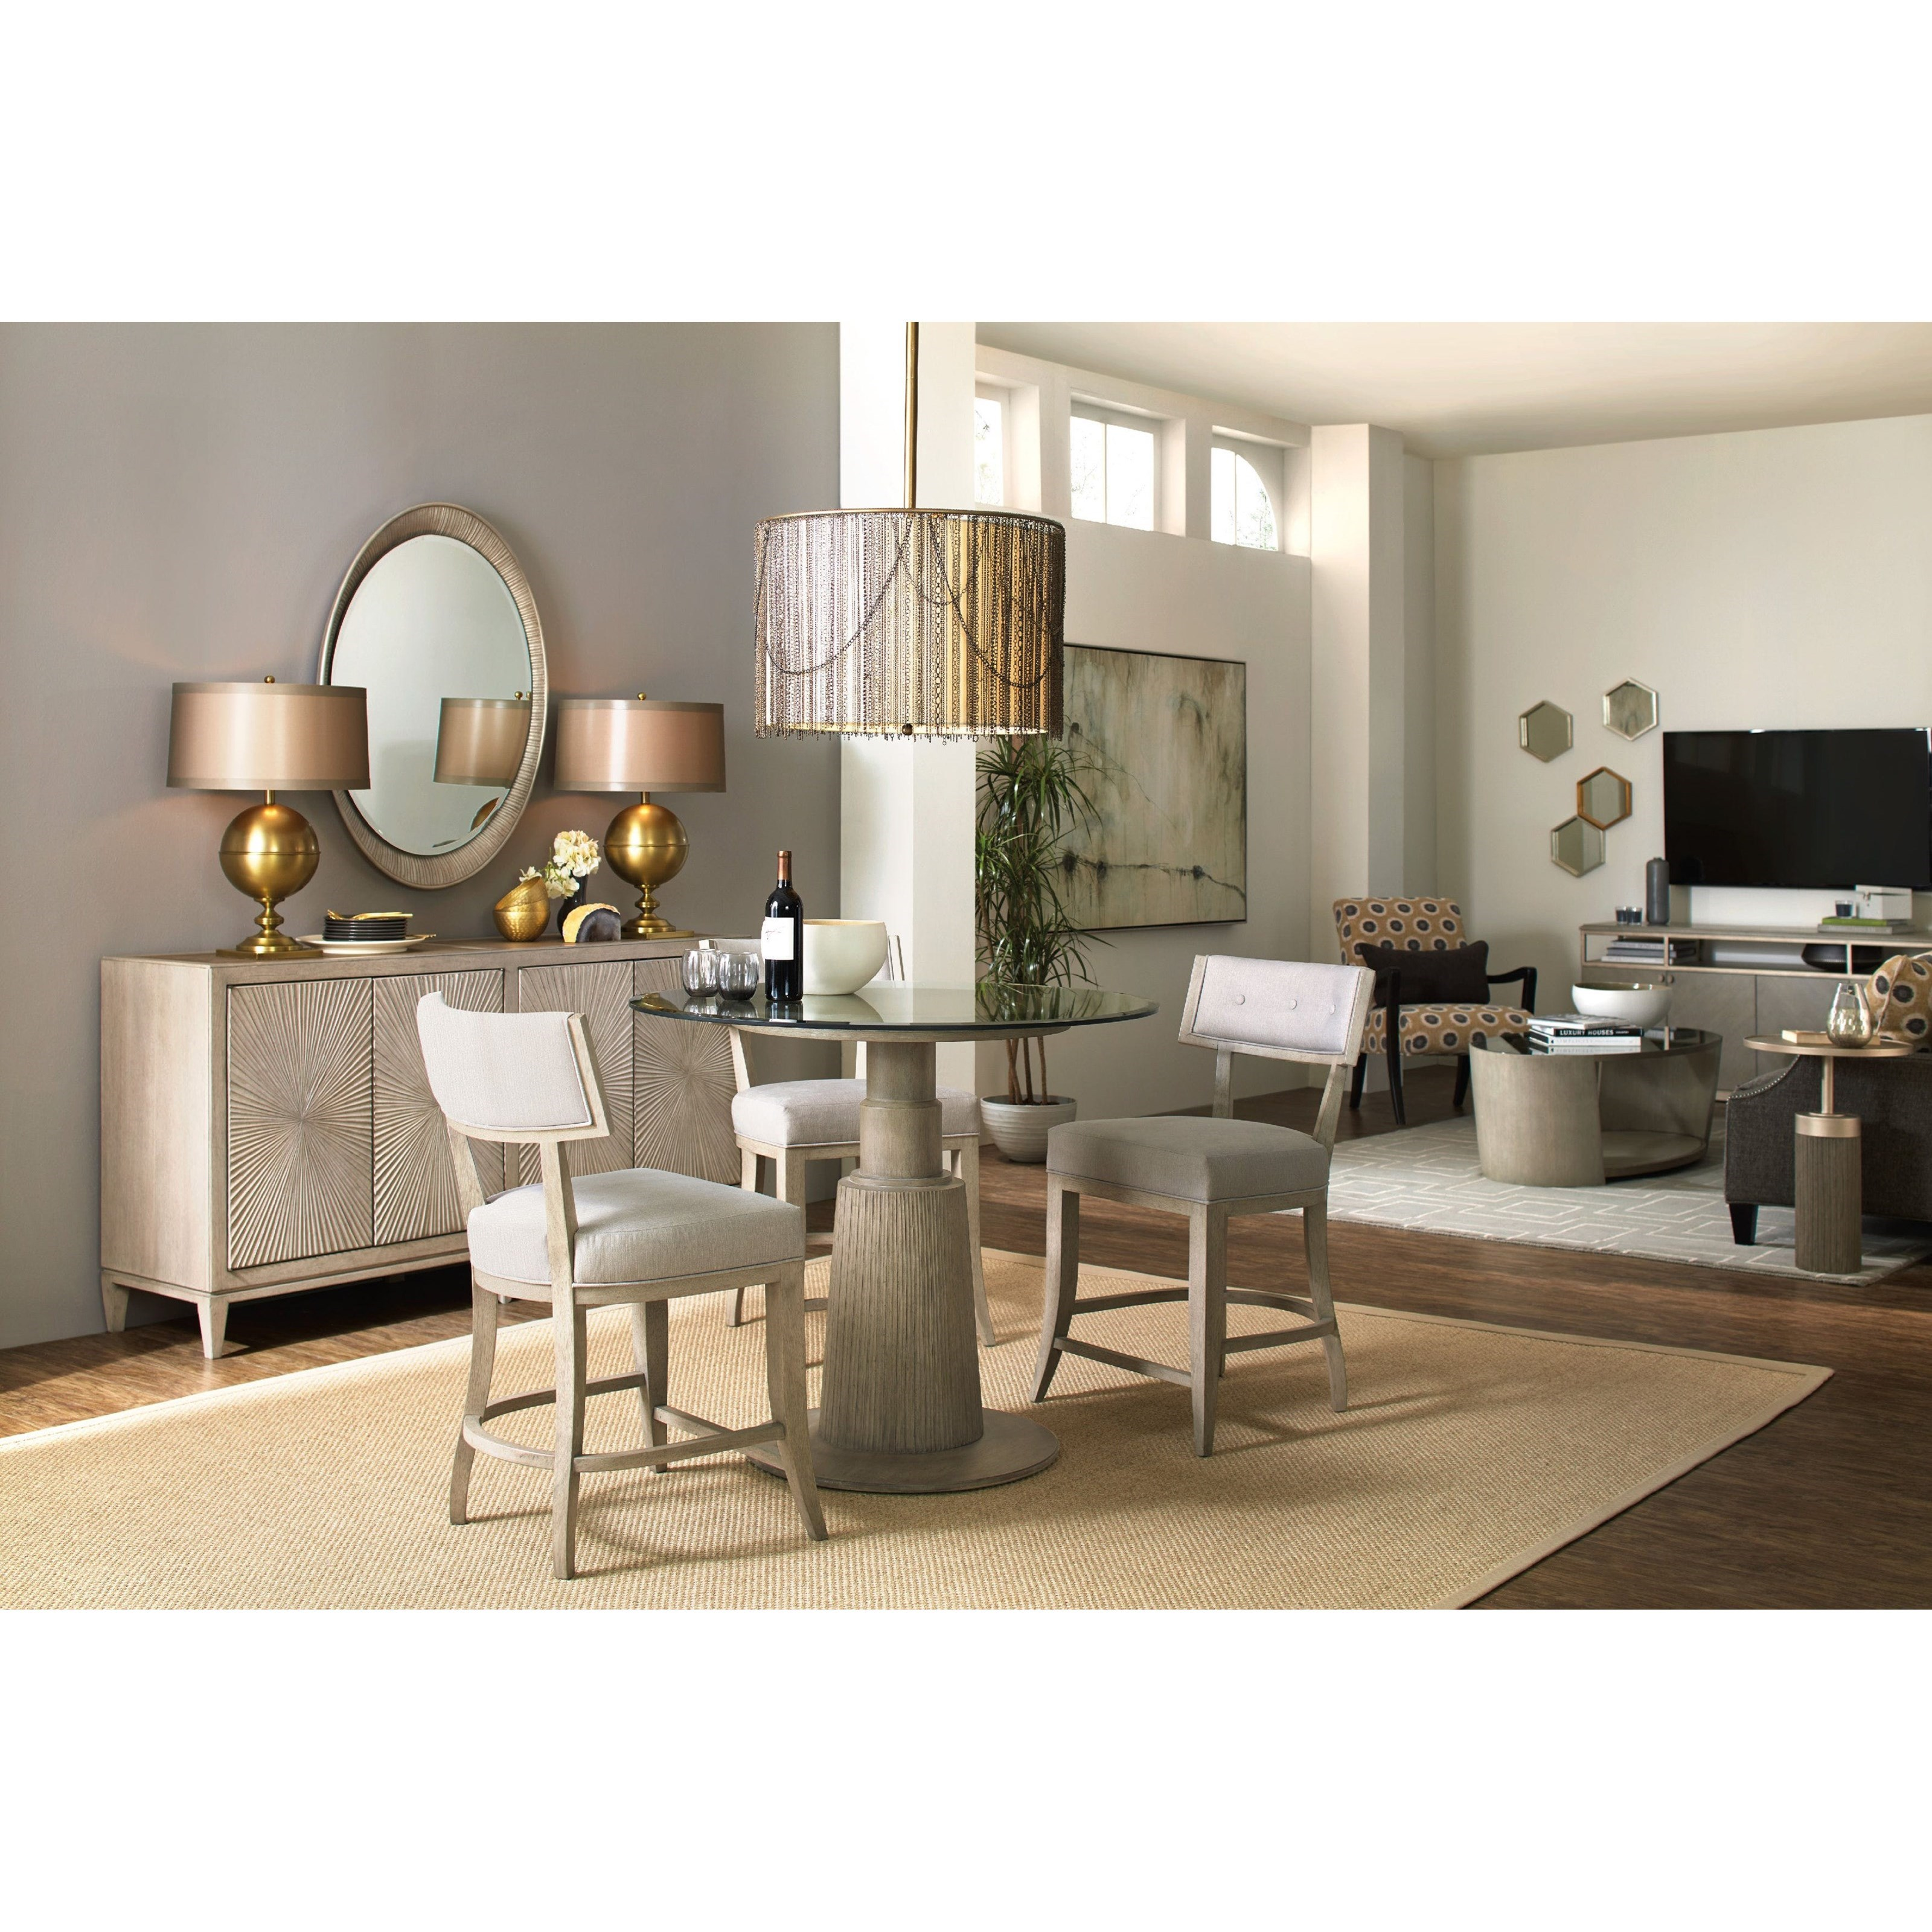 Hooker Furniture Elixir Klismos Upholstered Counter Stool